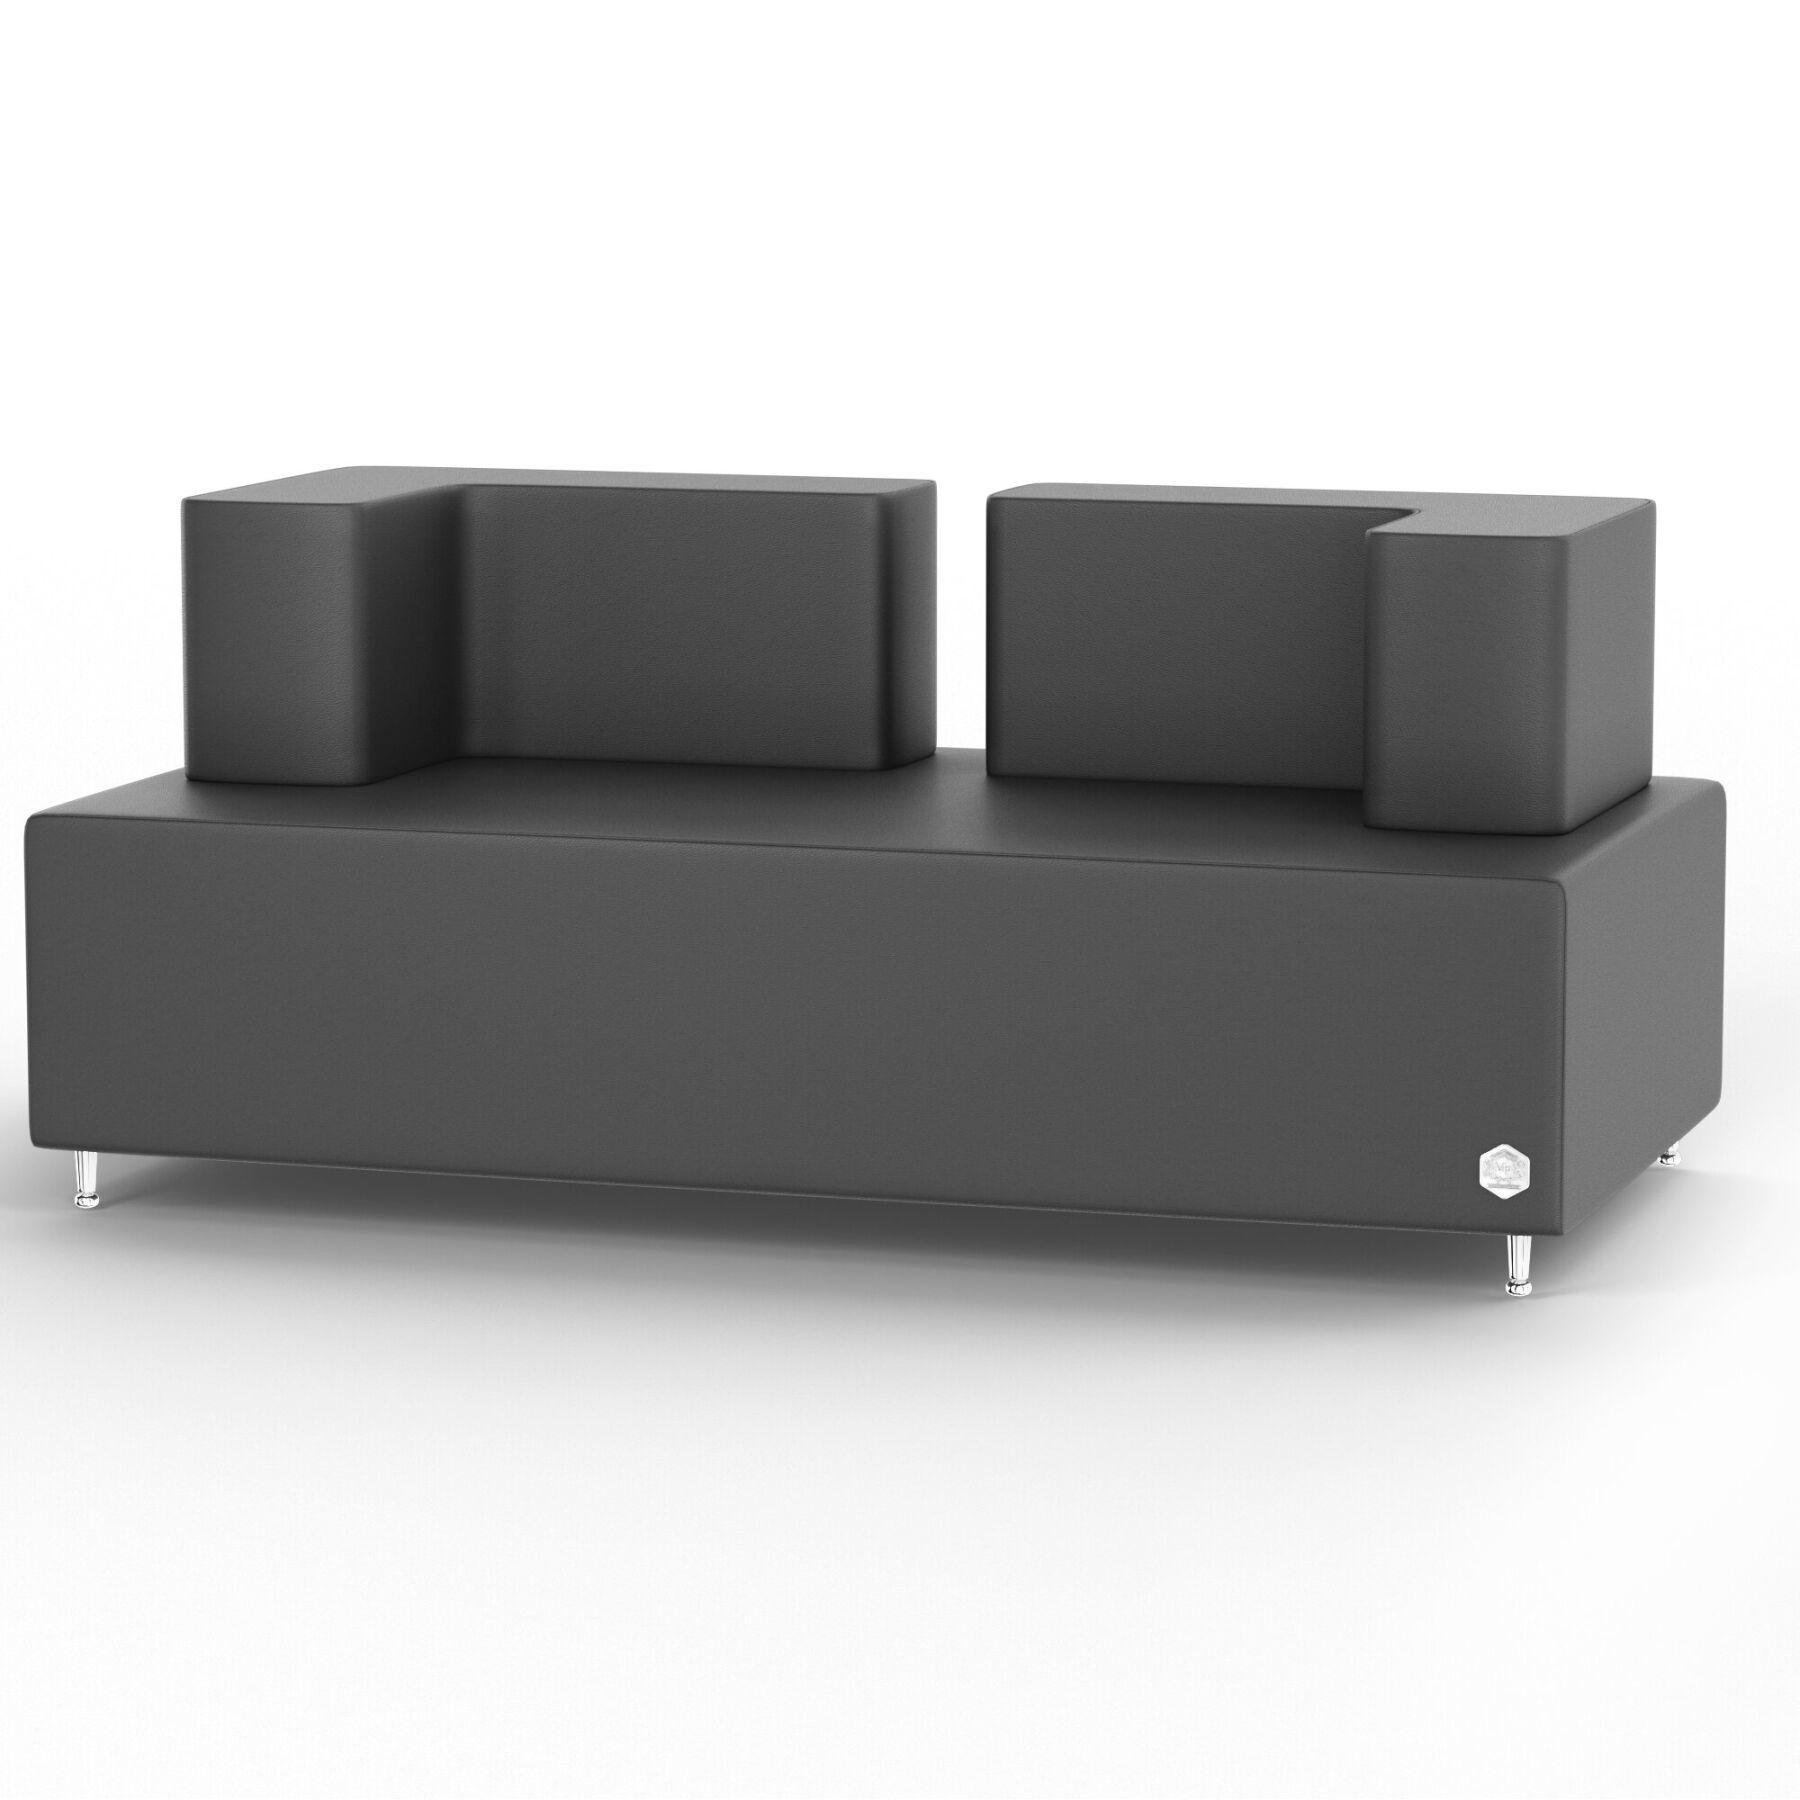 Двухместный диван KULIK SYSTEM BASE Кожа Целый